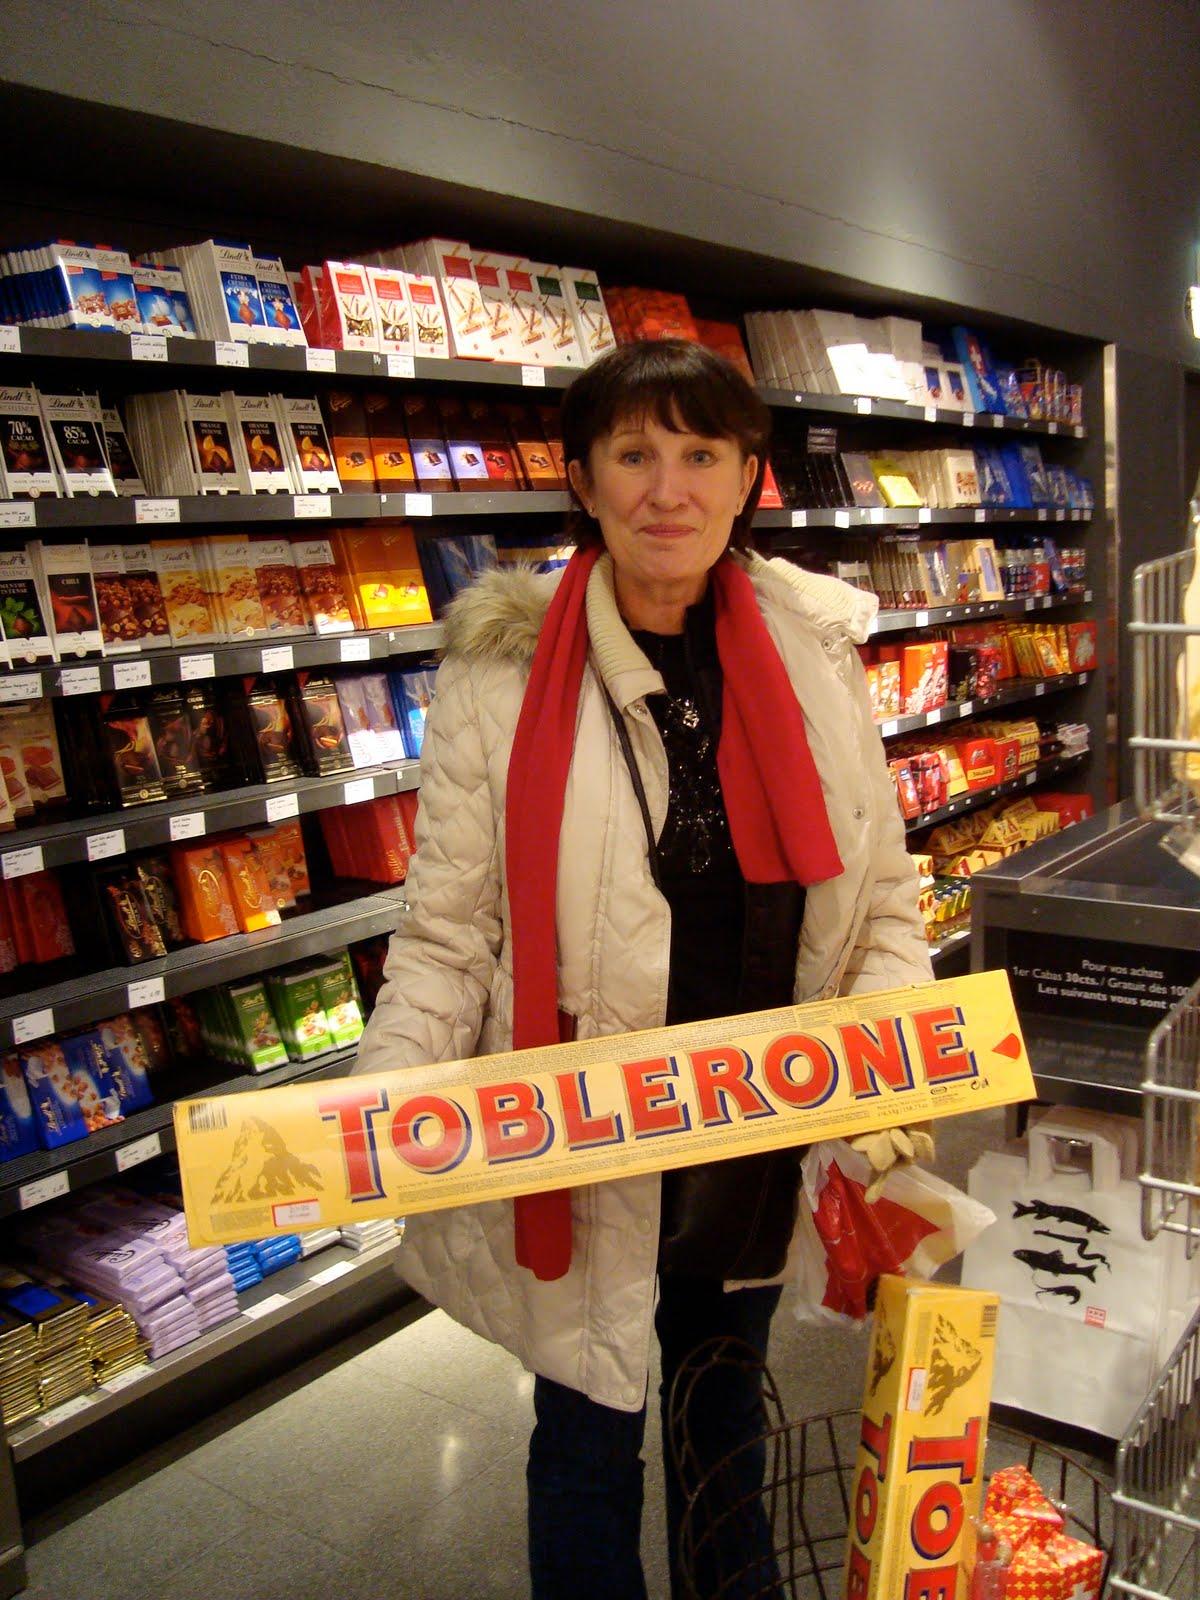 [toblerone]